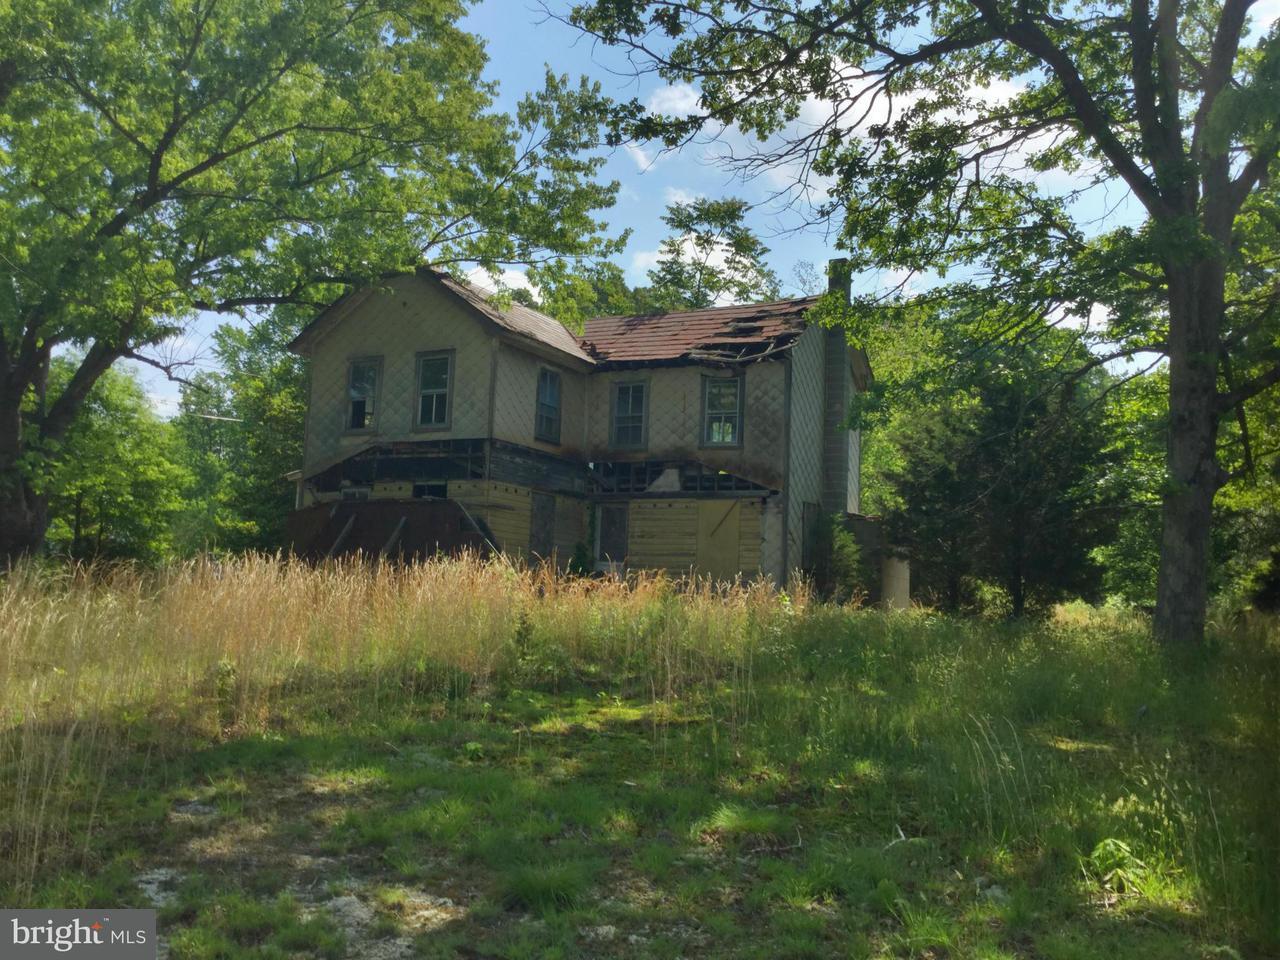 Land for Sale at 5060 Marbury Run Rd Marbury, Maryland 20658 United States